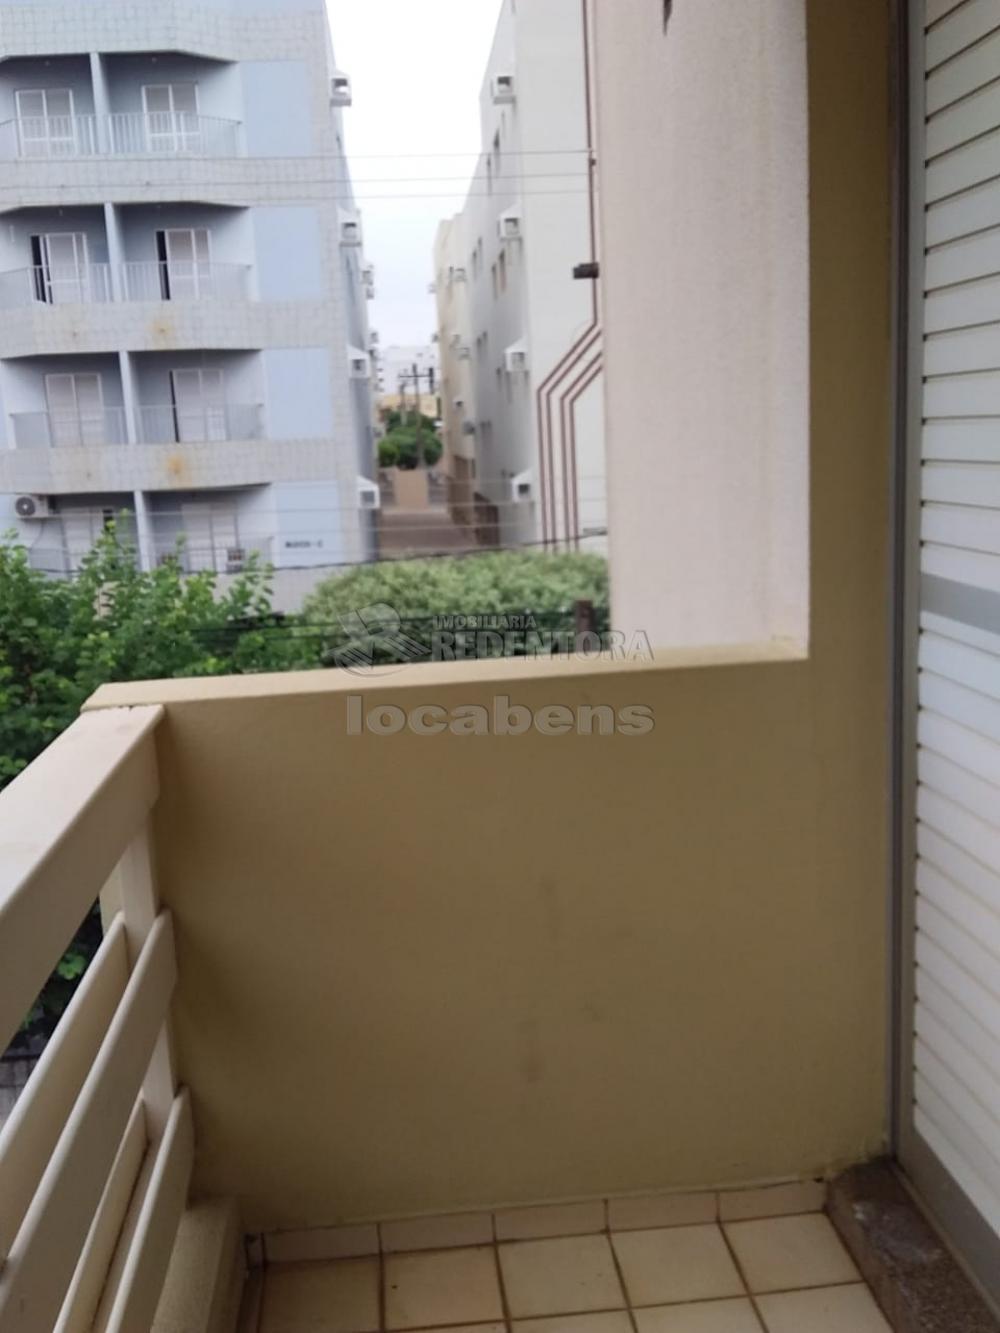 Sao Jose do Rio Preto Apartamento Venda R$270.000,00 Condominio R$480,00 3 Dormitorios 2 Vagas Area construida 106.00m2